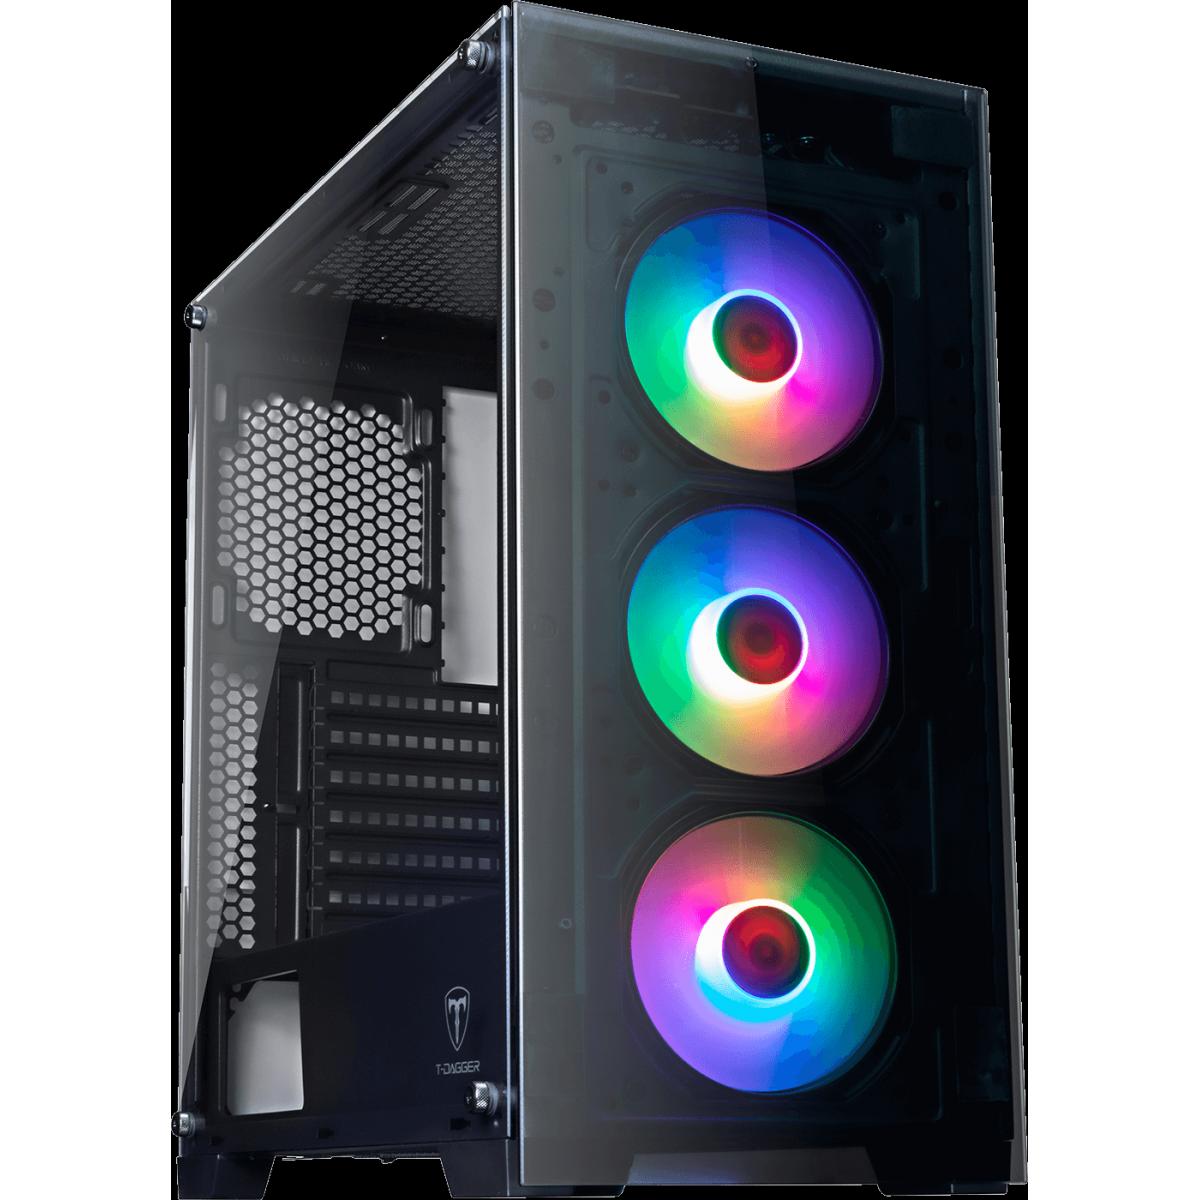 Pc Gamer Tera Edition Amd Ryzen 5 3600 / Radeon NAVI RX 5700 XT 8GB / DDR4 8GB / HD 1TB / 600W